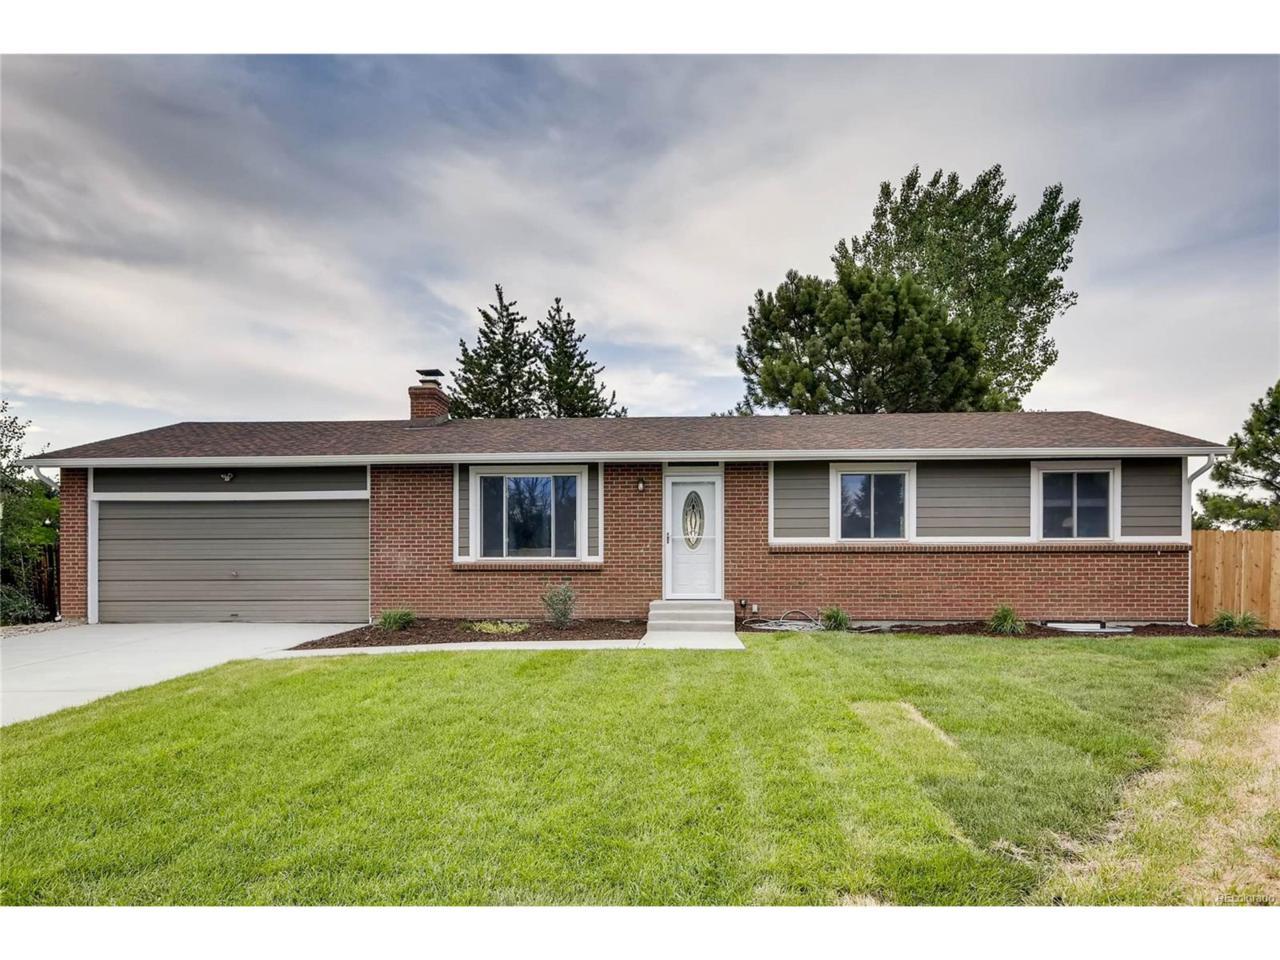 6528 S Cody Way, Littleton, CO 80123 (MLS #5137071) :: 8z Real Estate